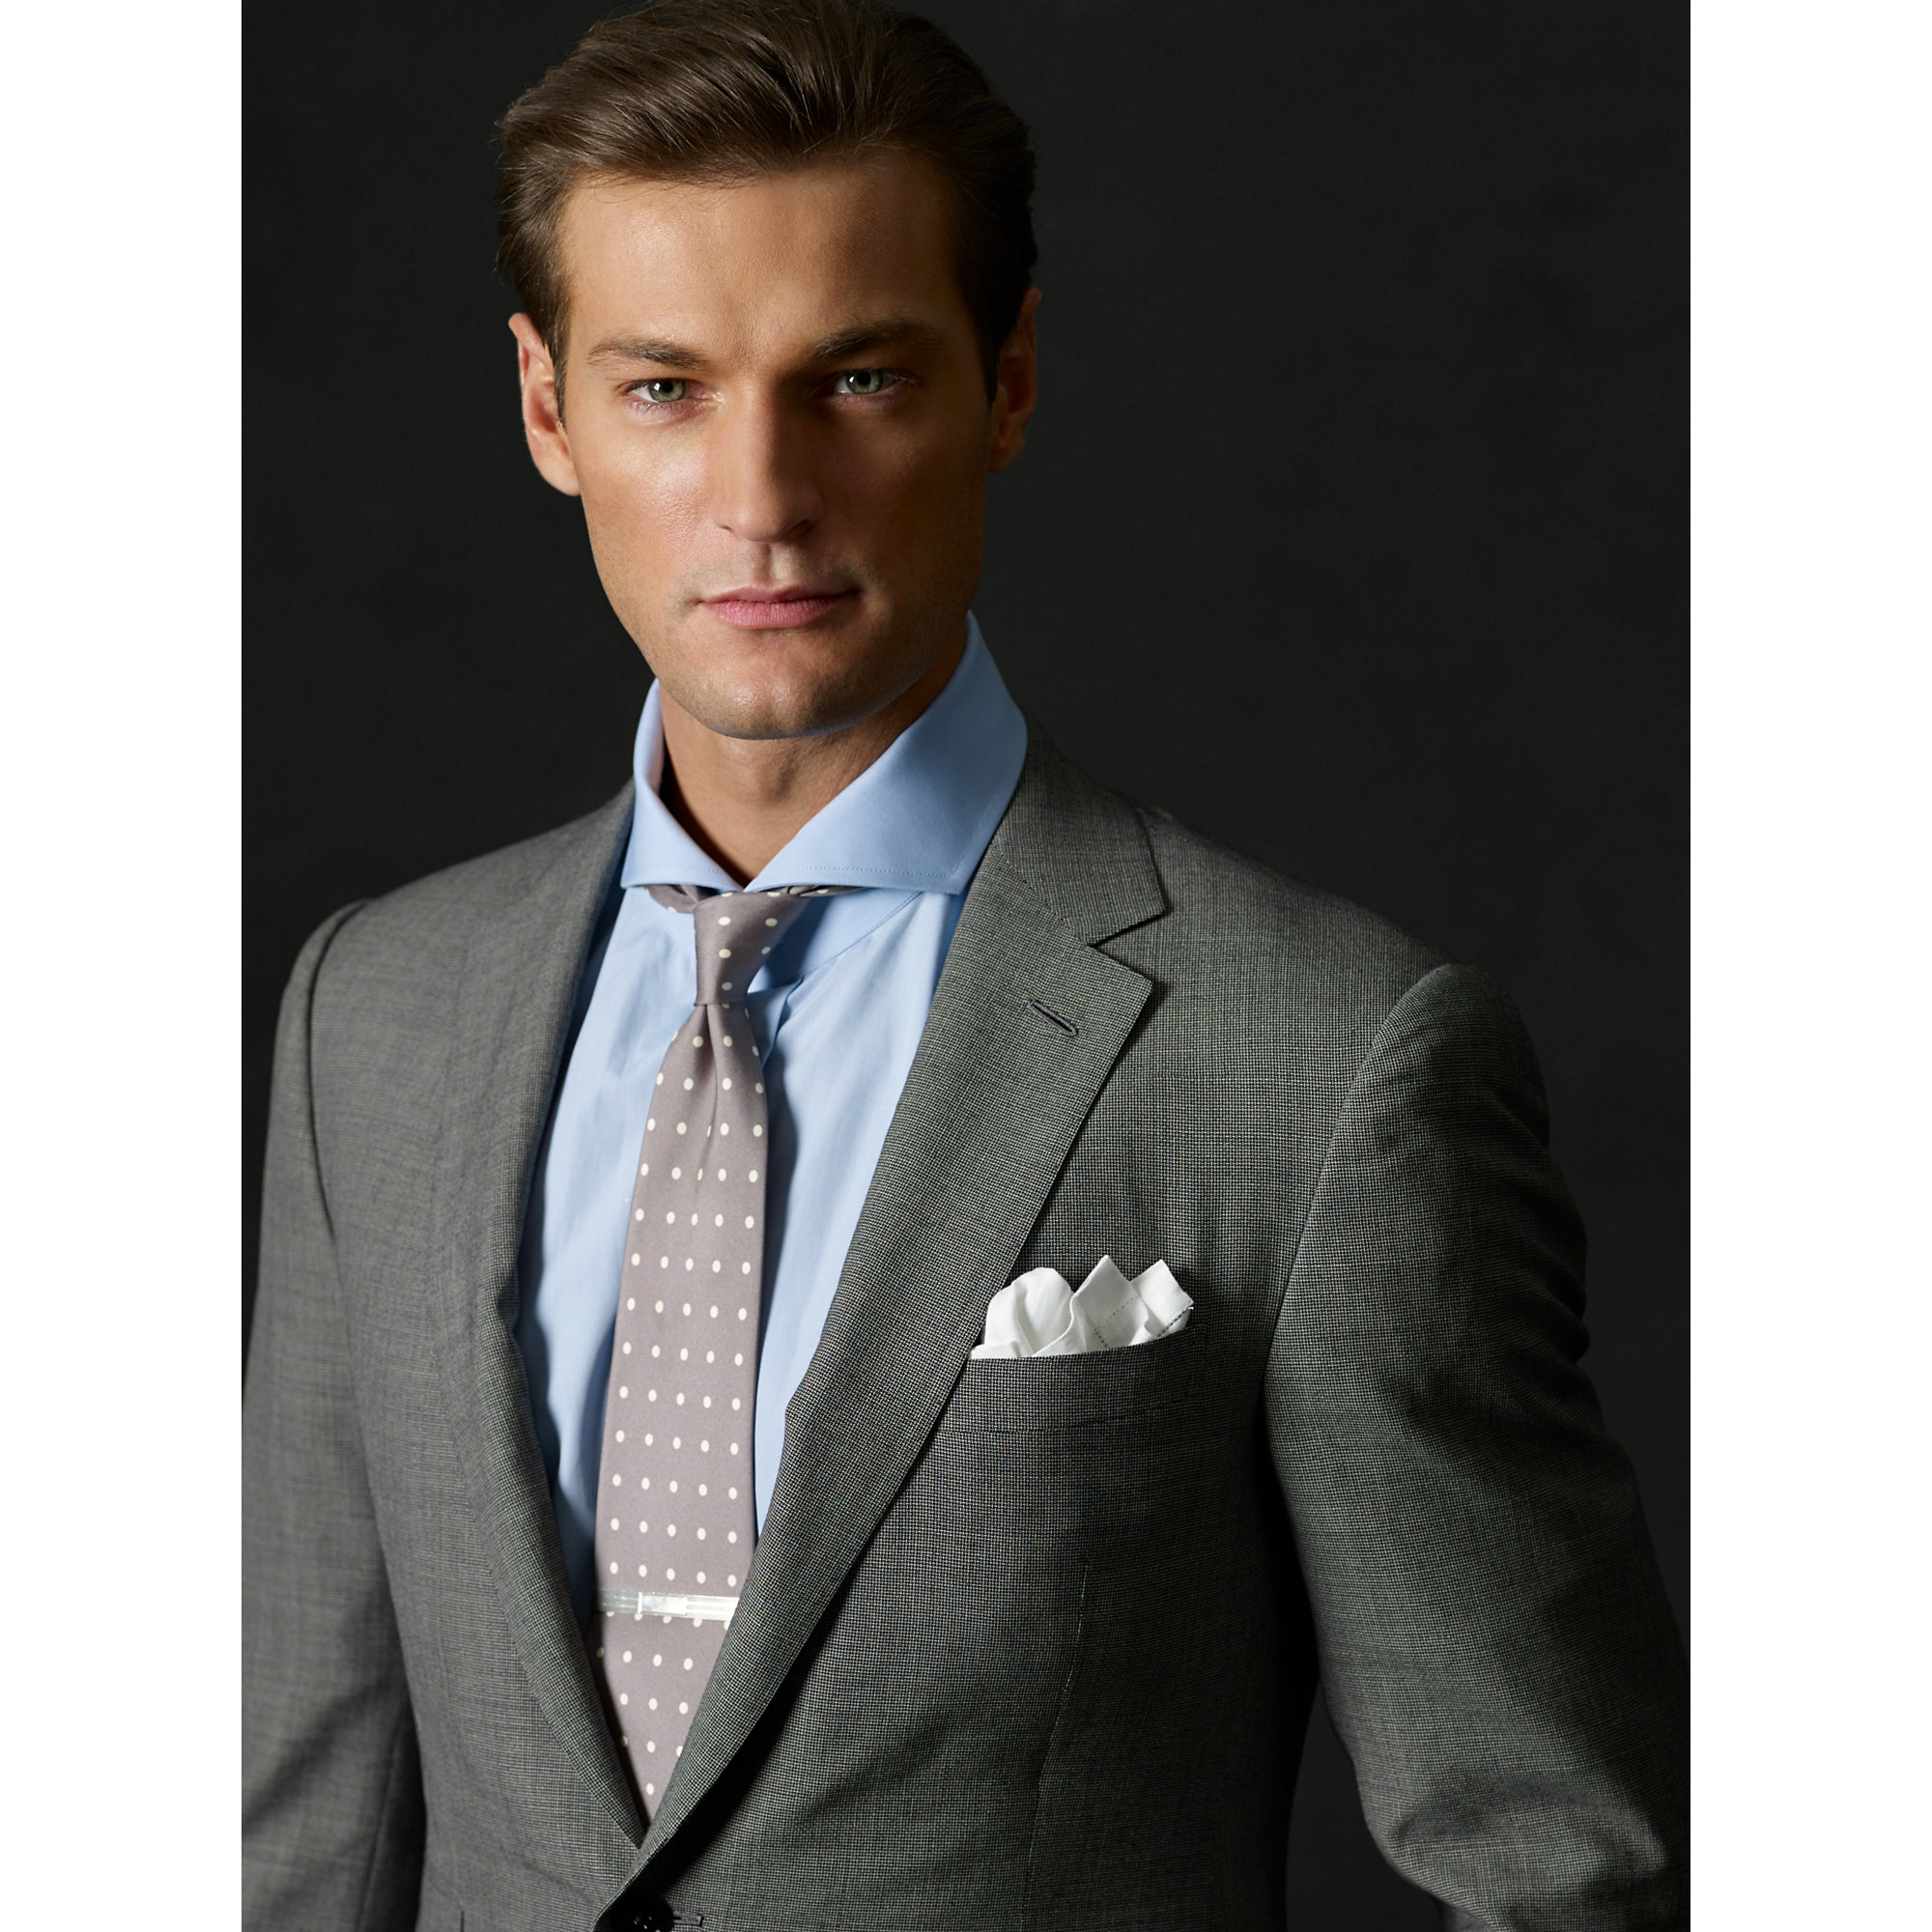 Lyst - Ralph Lauren Purple Label Custom-Fit Deco Suit in Black for Men